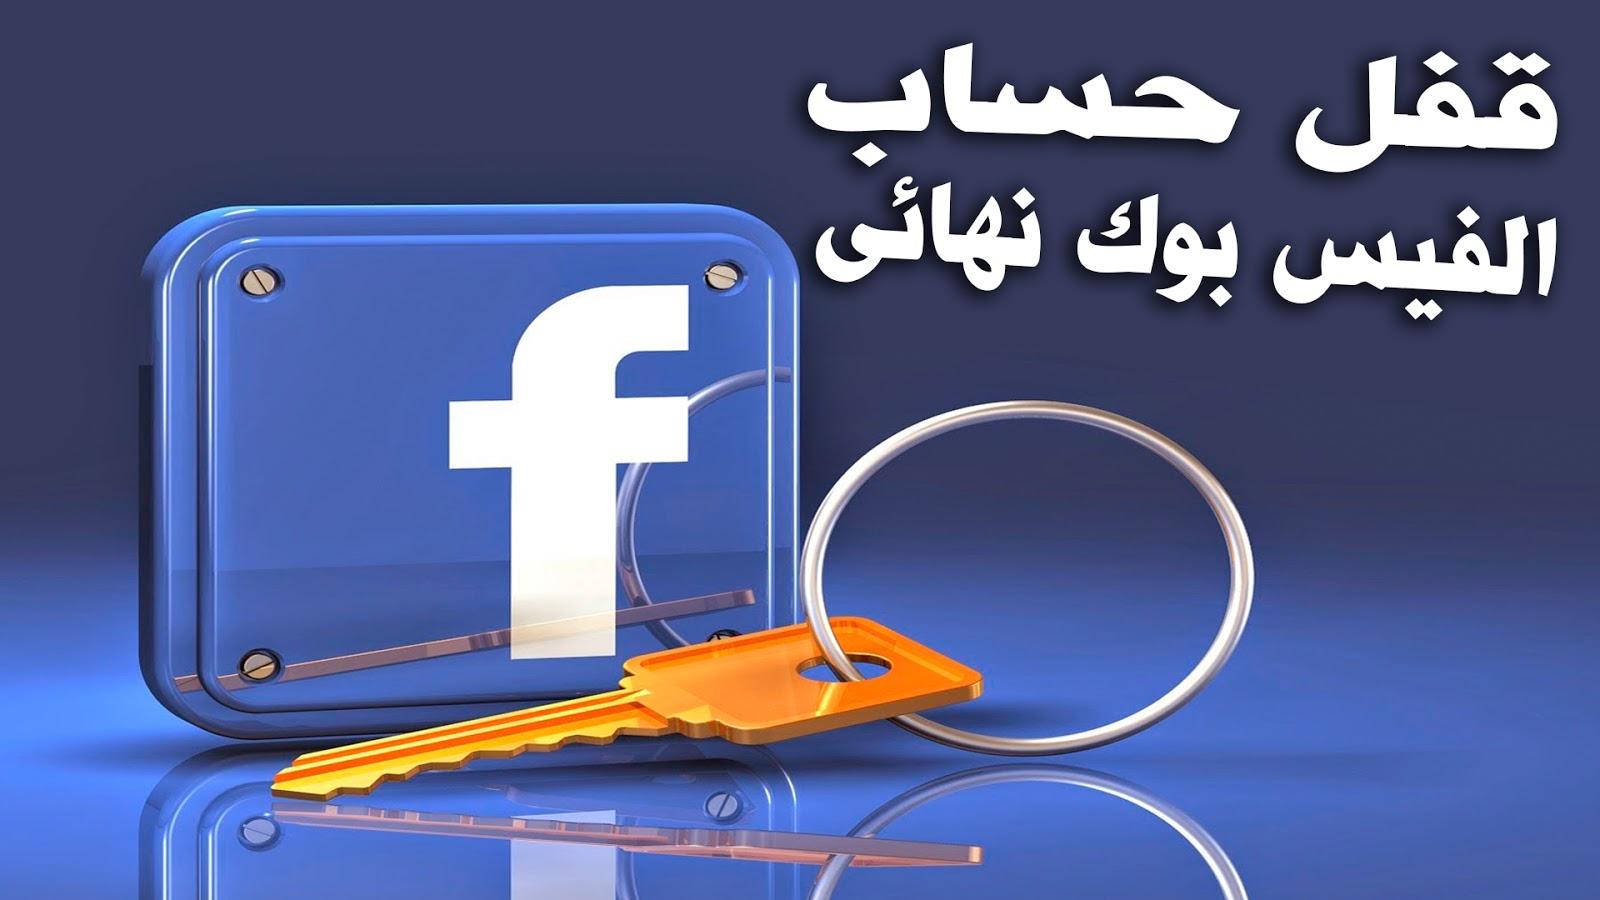 Photo of قفل حساب الفيس بوك نهائيا وحذفه من الشركه